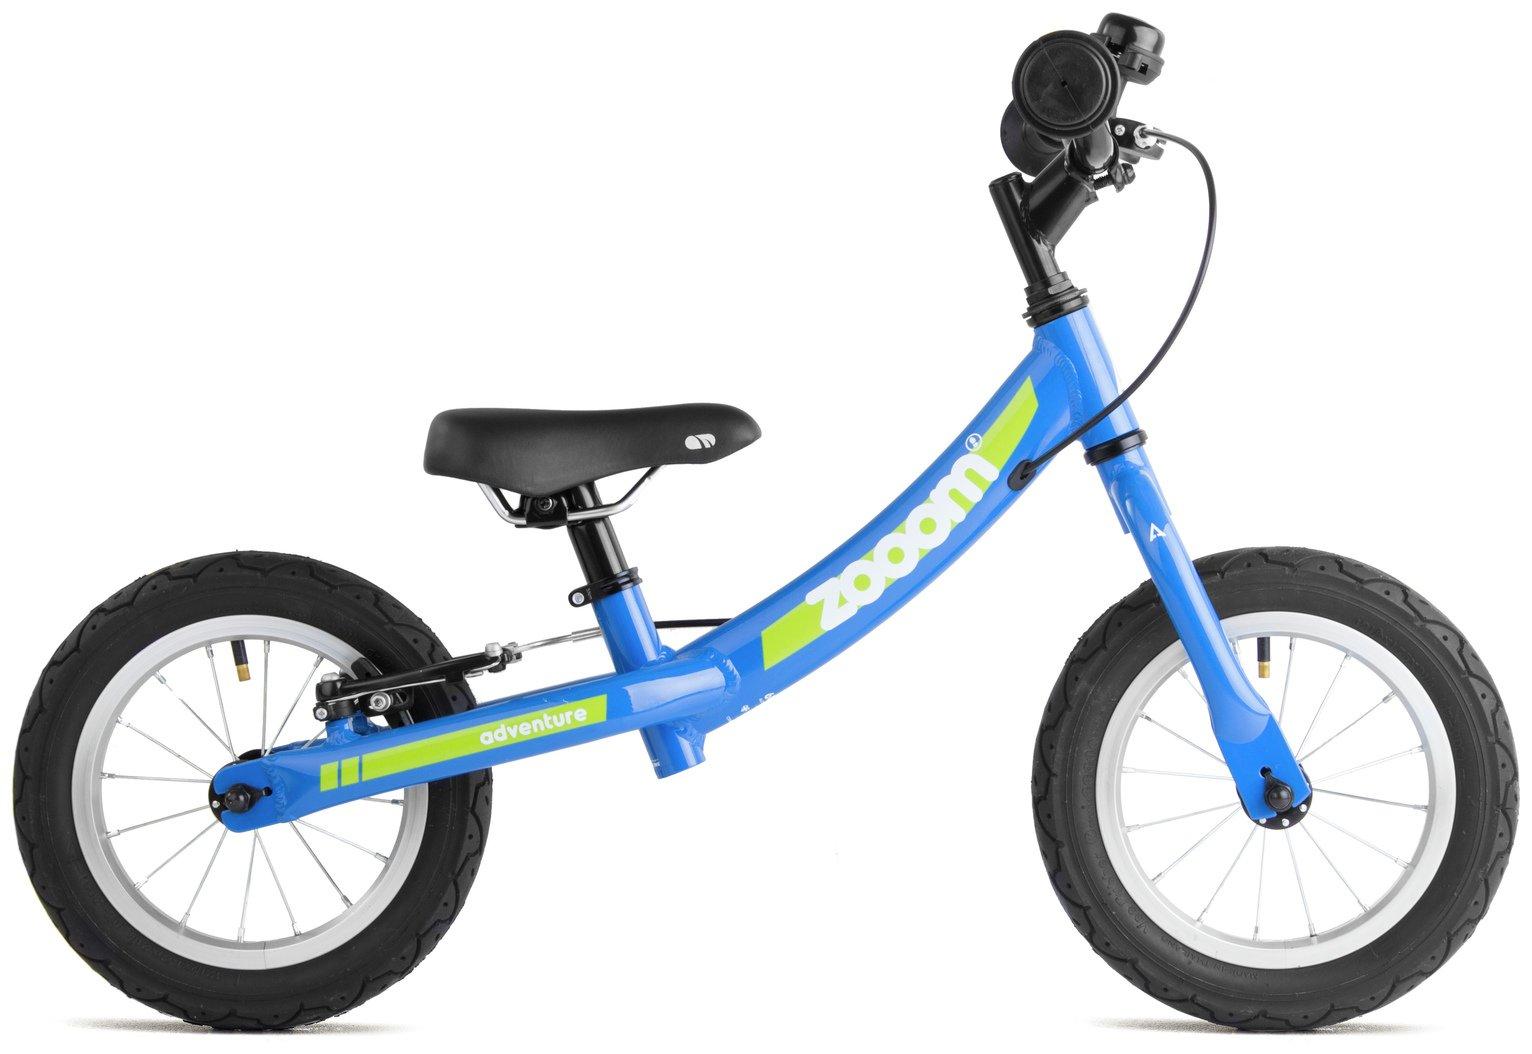 Image of Adventure Zooom Balance Bike - Bike.